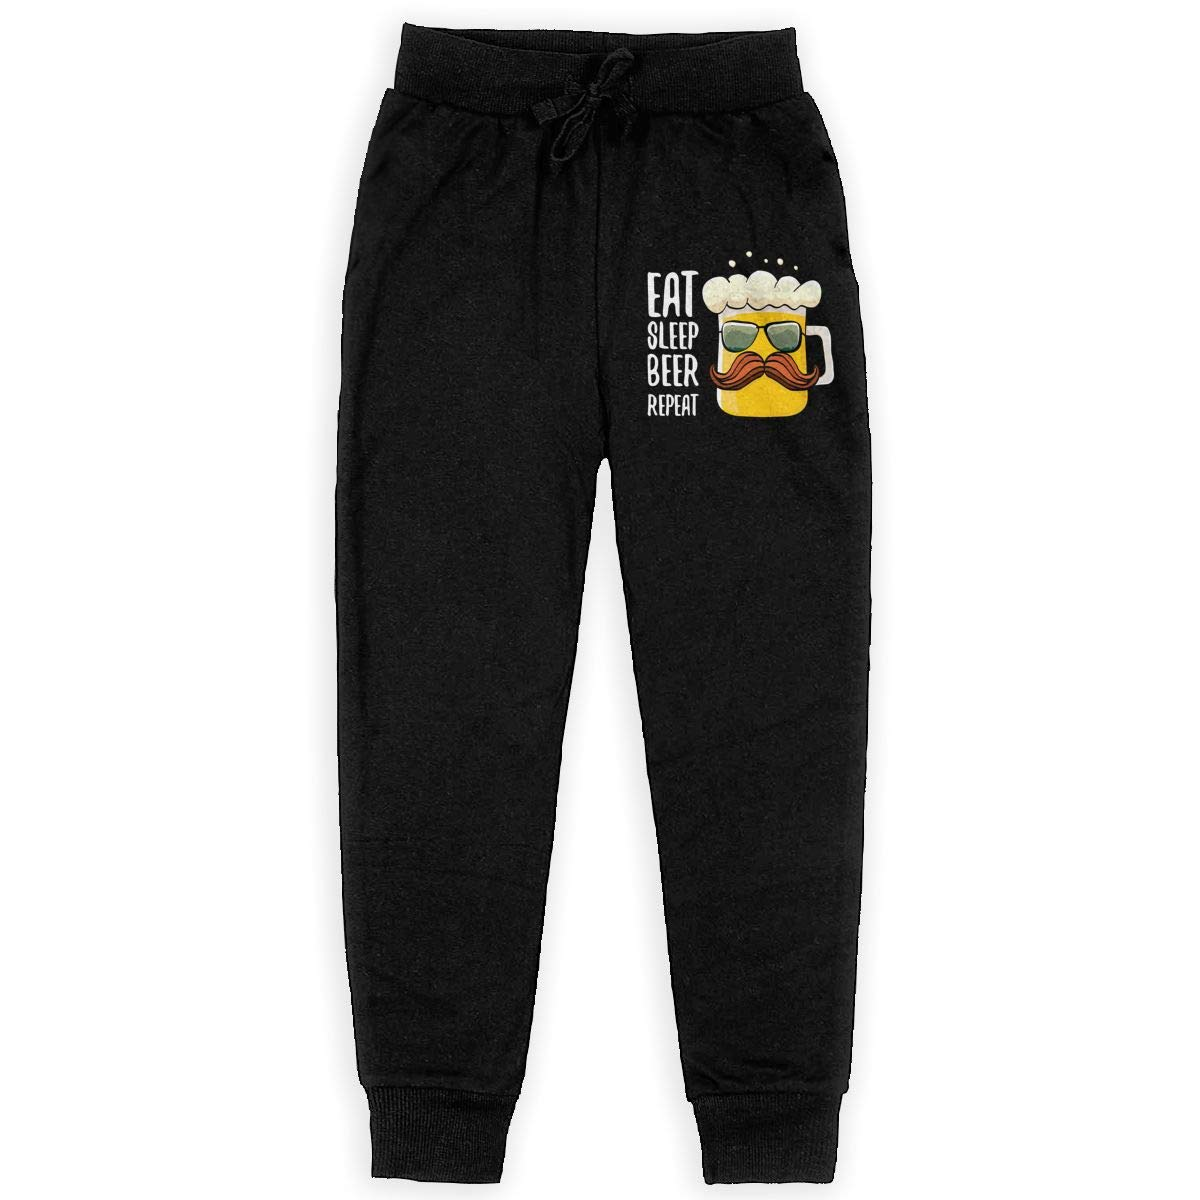 Xinding Boys Casual Sweatpants Eat Sleep Beer Repeat Adjustable Waist Pants with Pocket